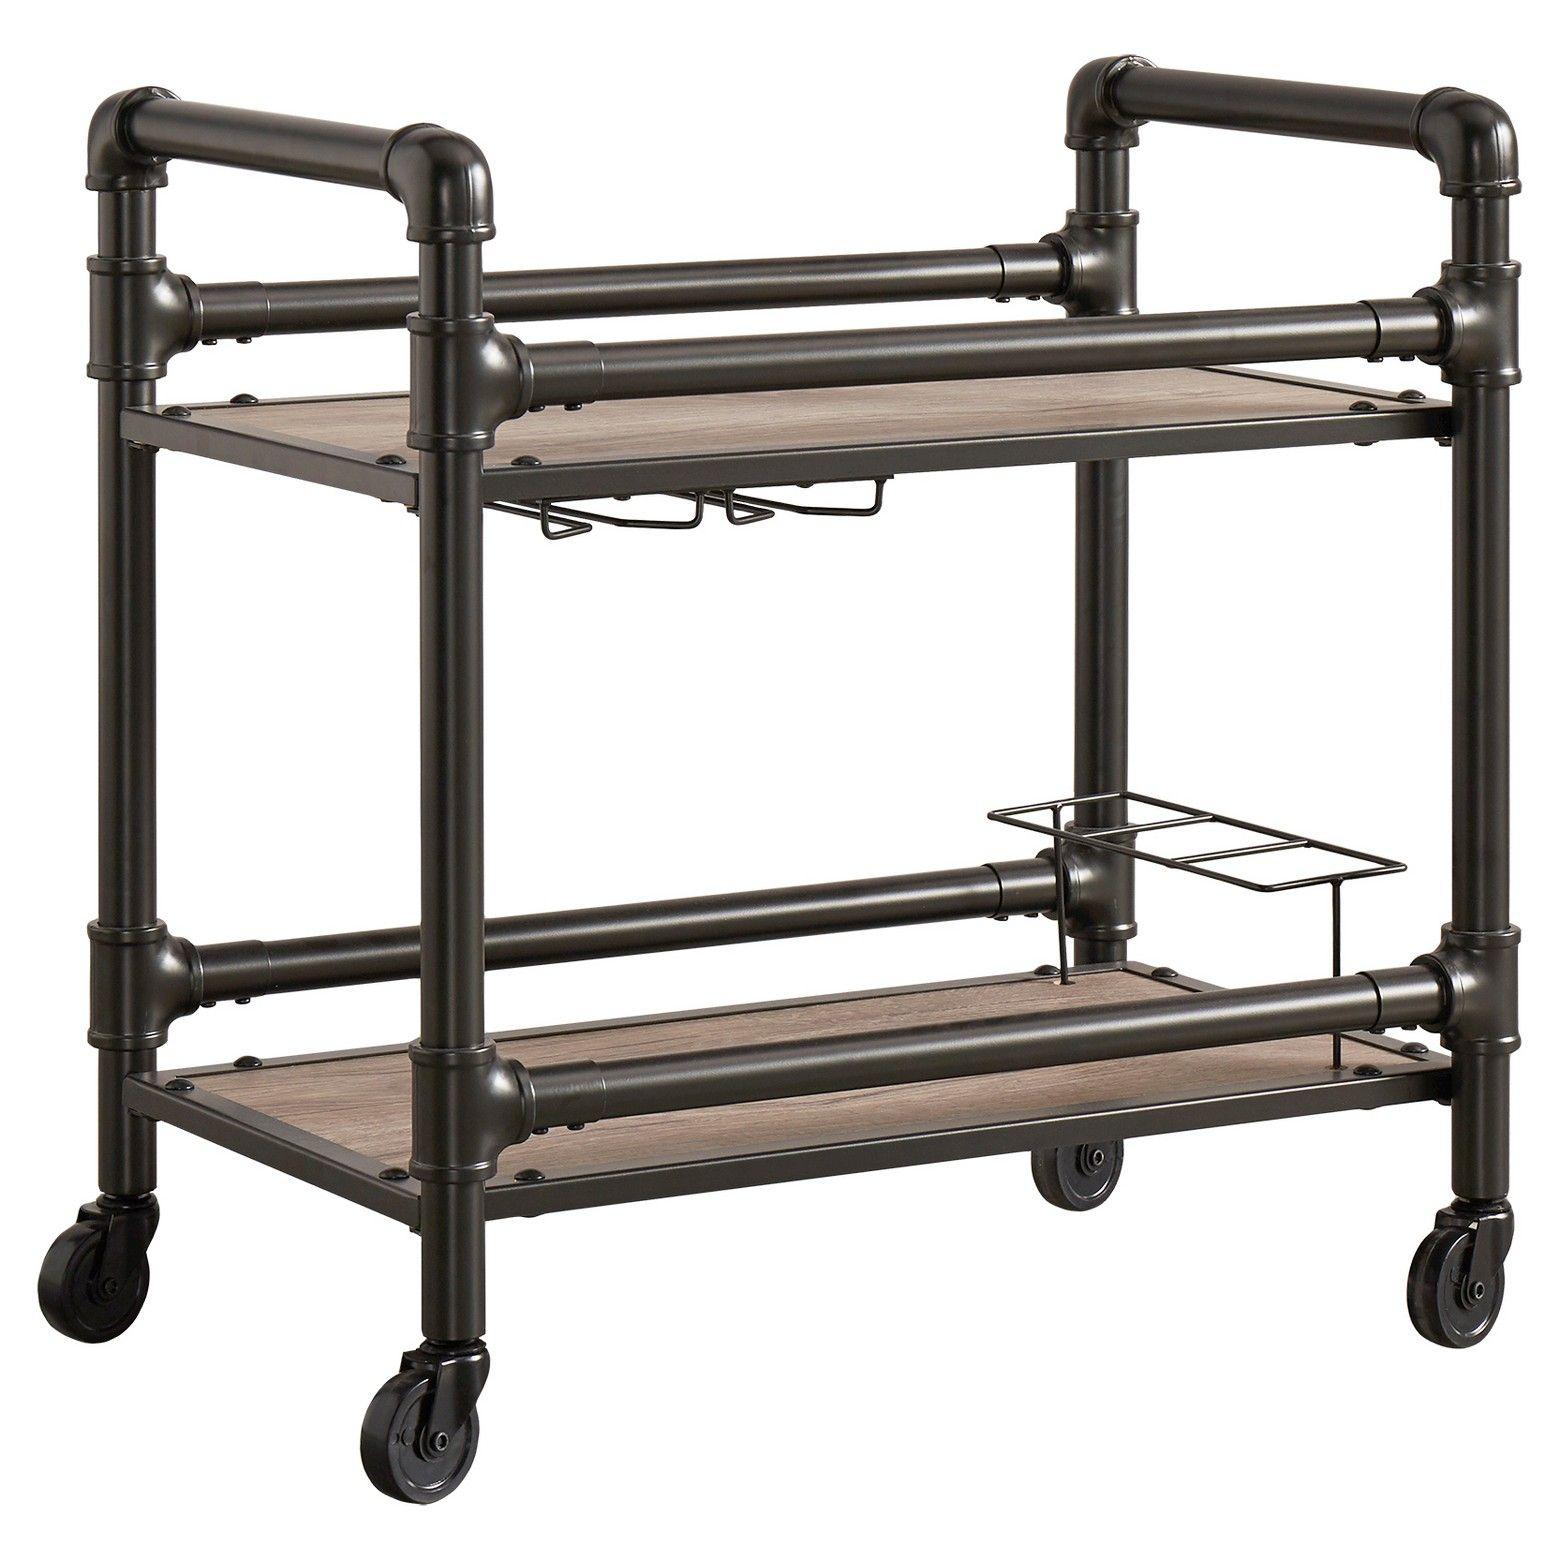 Emery Industrial Metal + Wood Bar Cart - Brown - Inspire Q